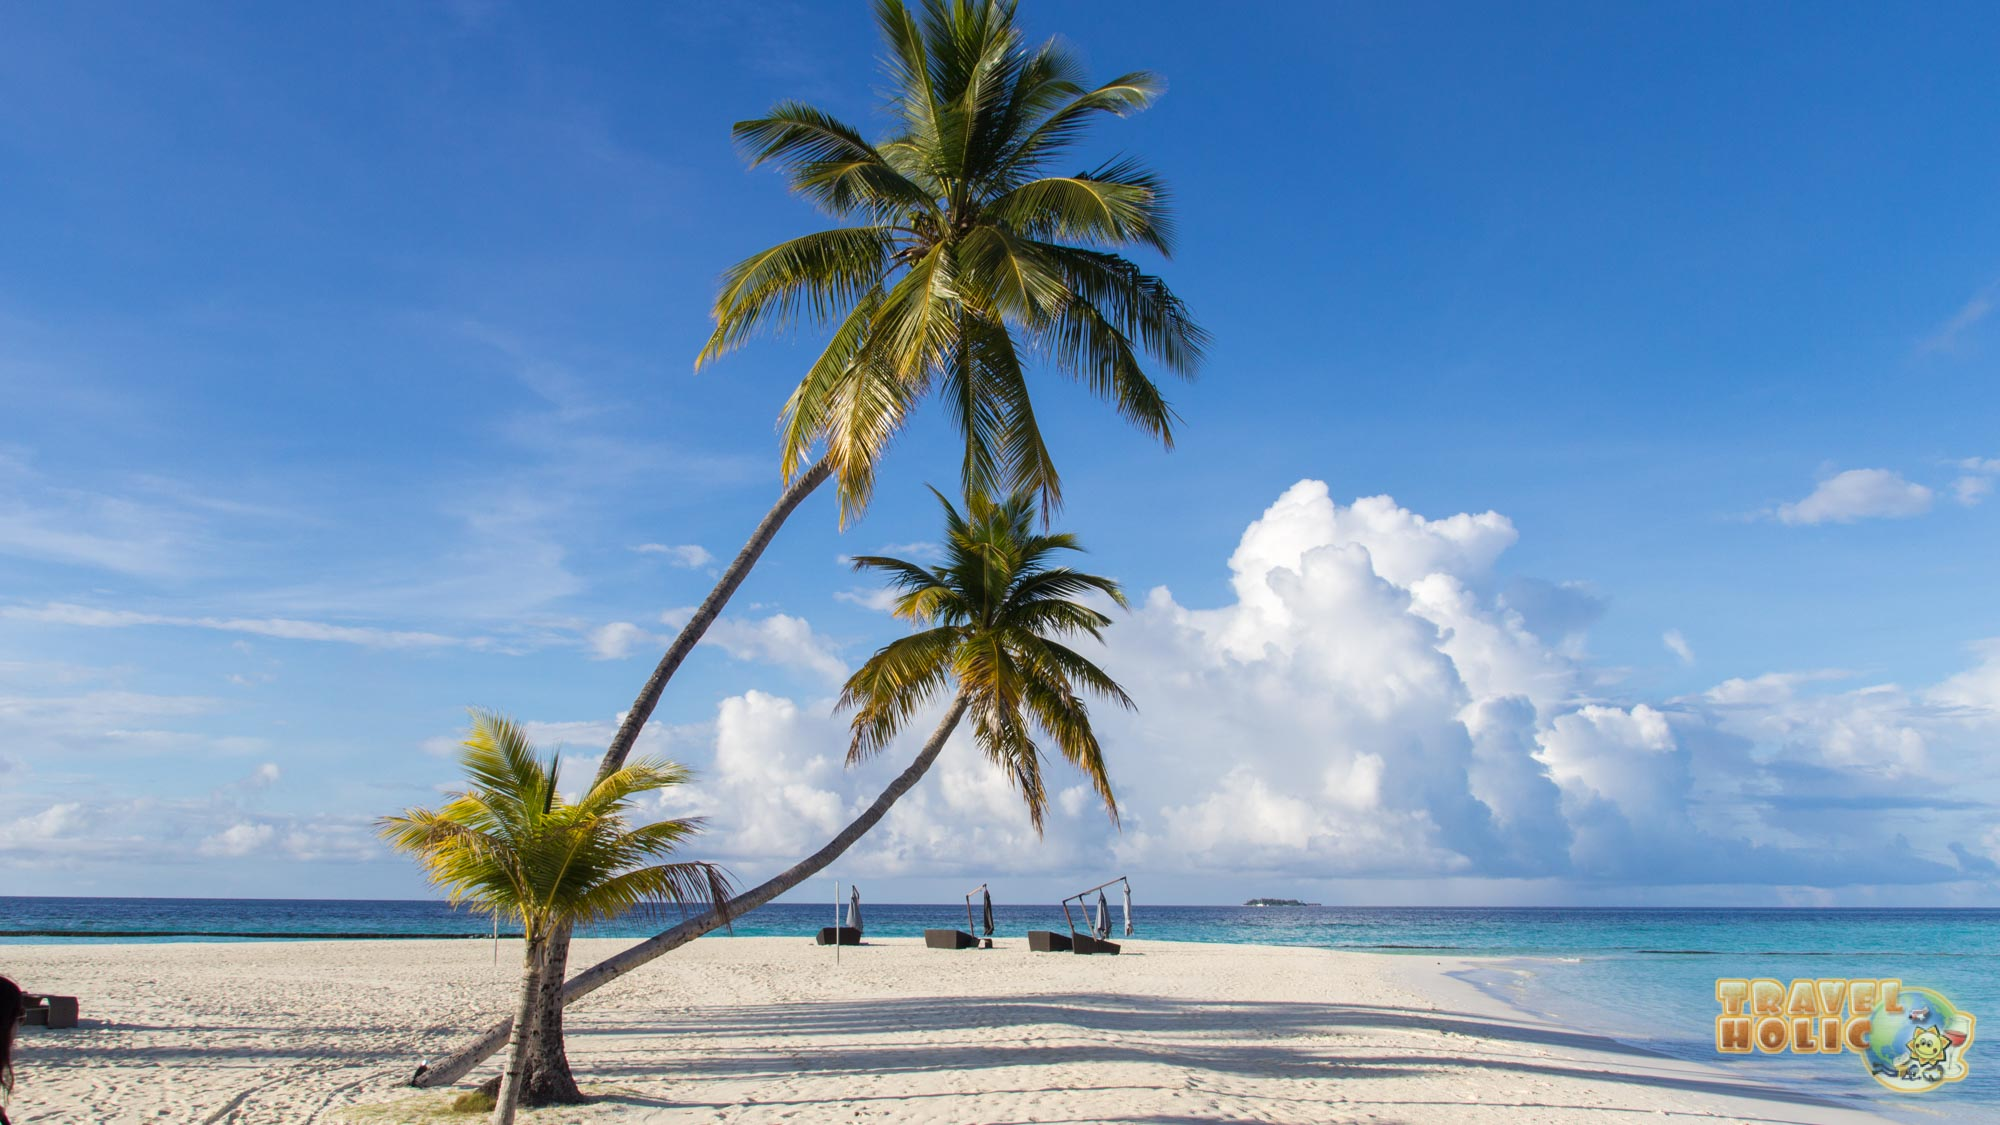 Plage du Constance Halaveli, Maldives